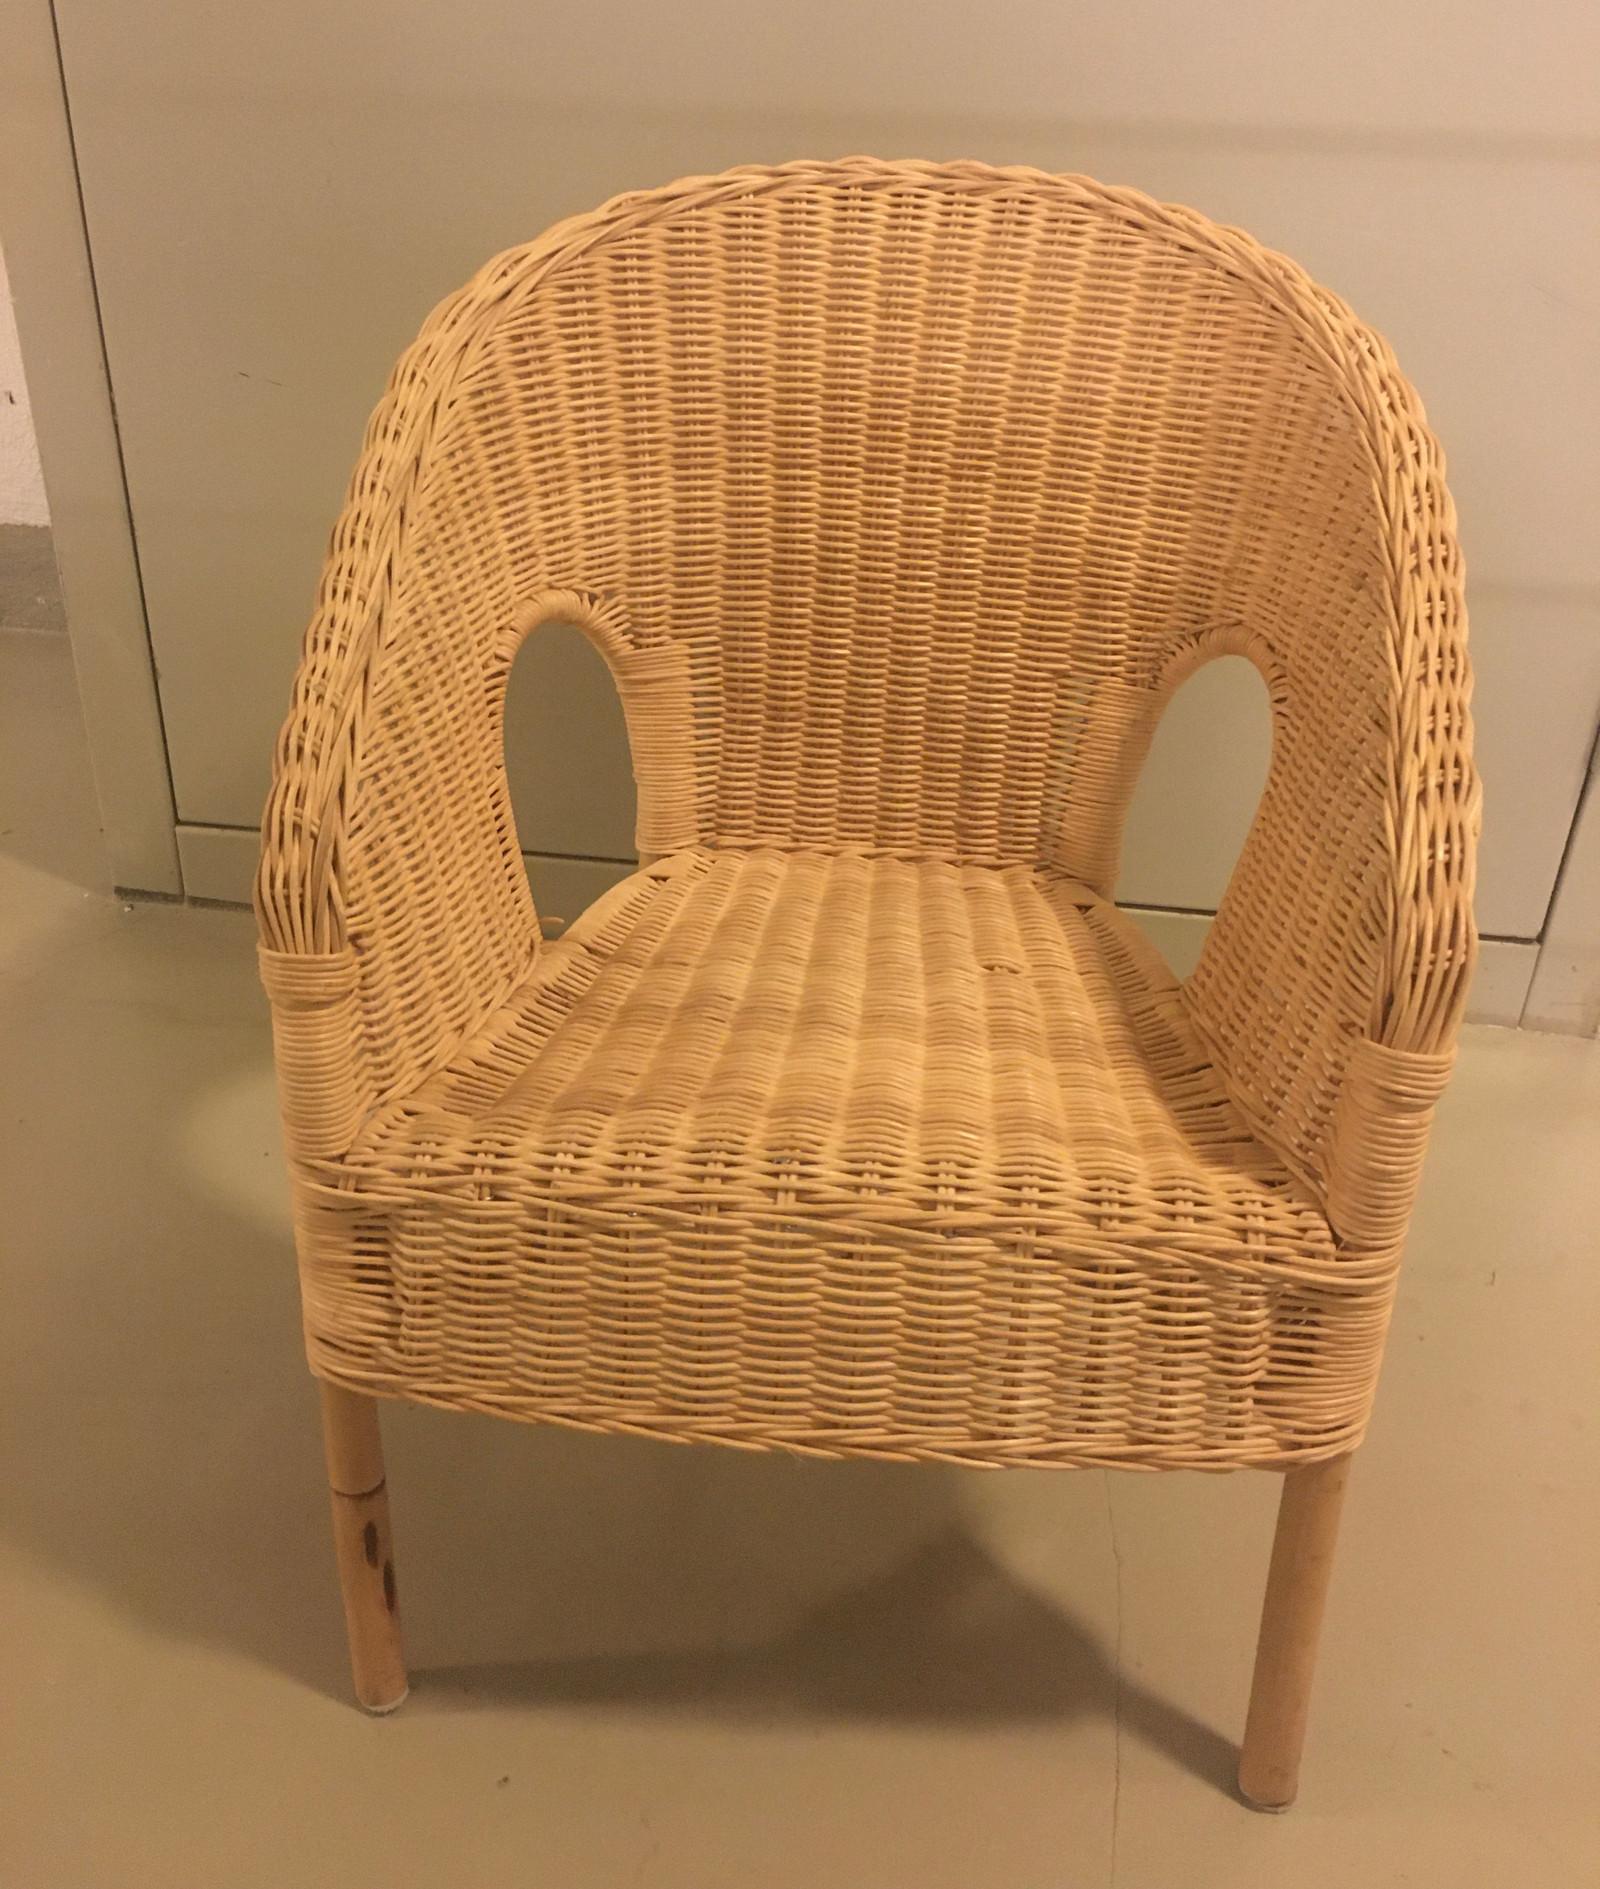 Fin Ikea Agen kurvstol i bambus mpute   FINN.no